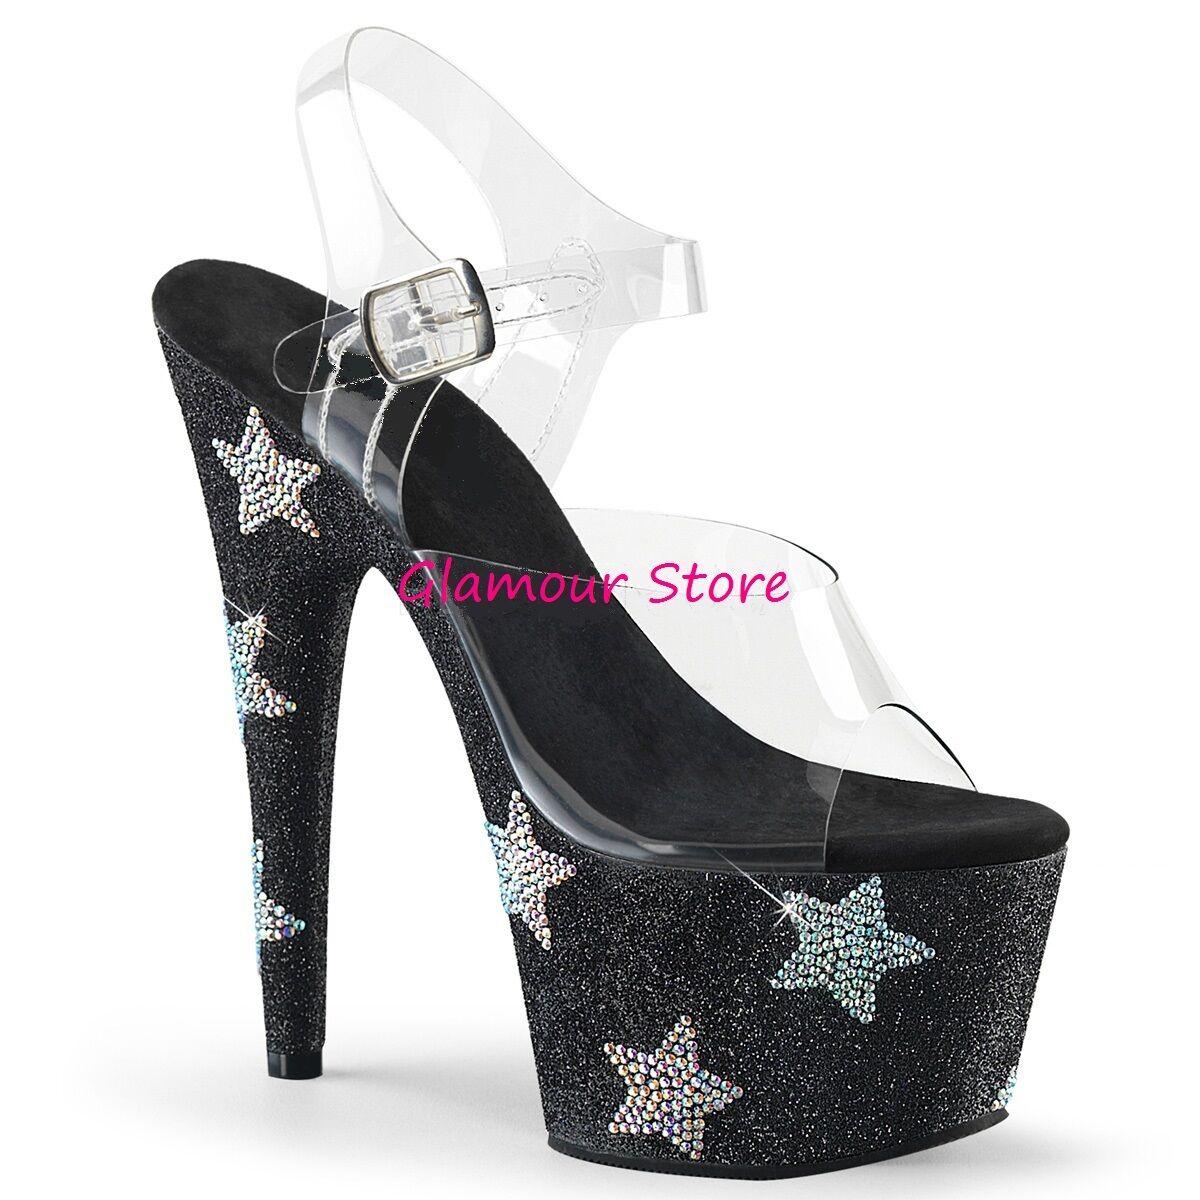 Sexy SANDALI GLITTER STRASS tacco 18 plateau dal 35 al 40 negro zapatos GLAMOUR